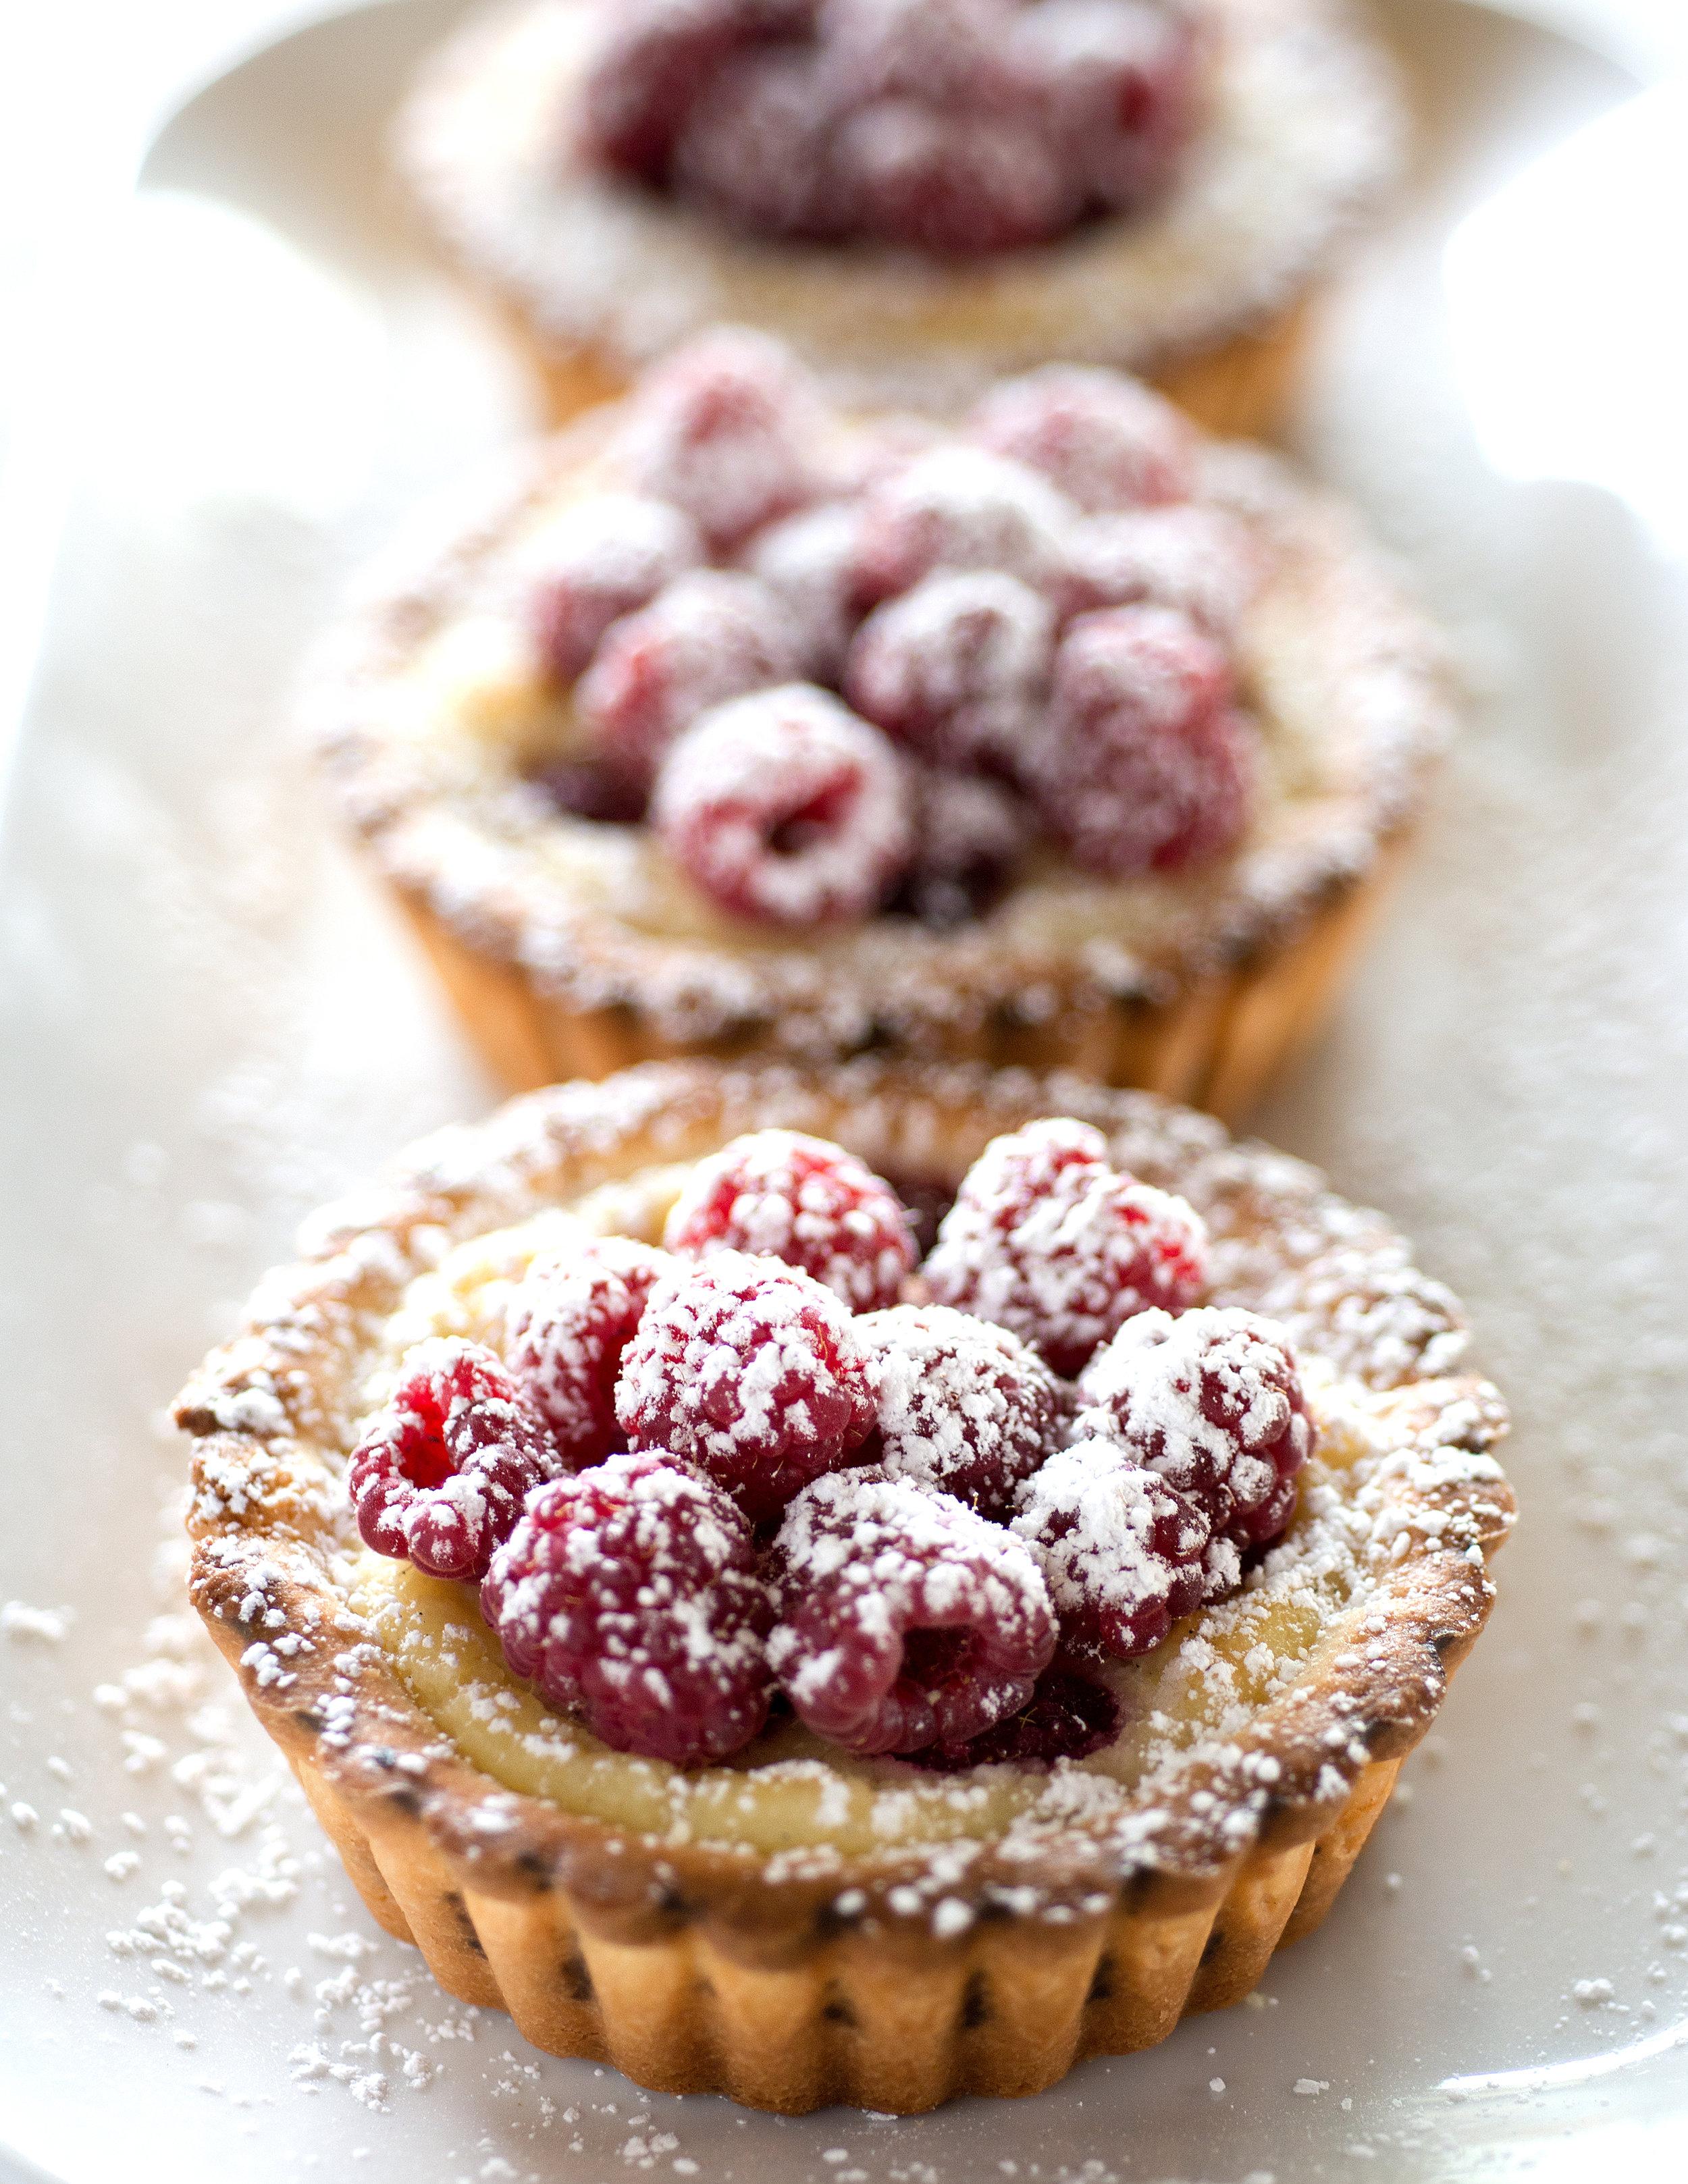 Sage Bakehouse Raspberry Pastry Santa Fe New Mexico